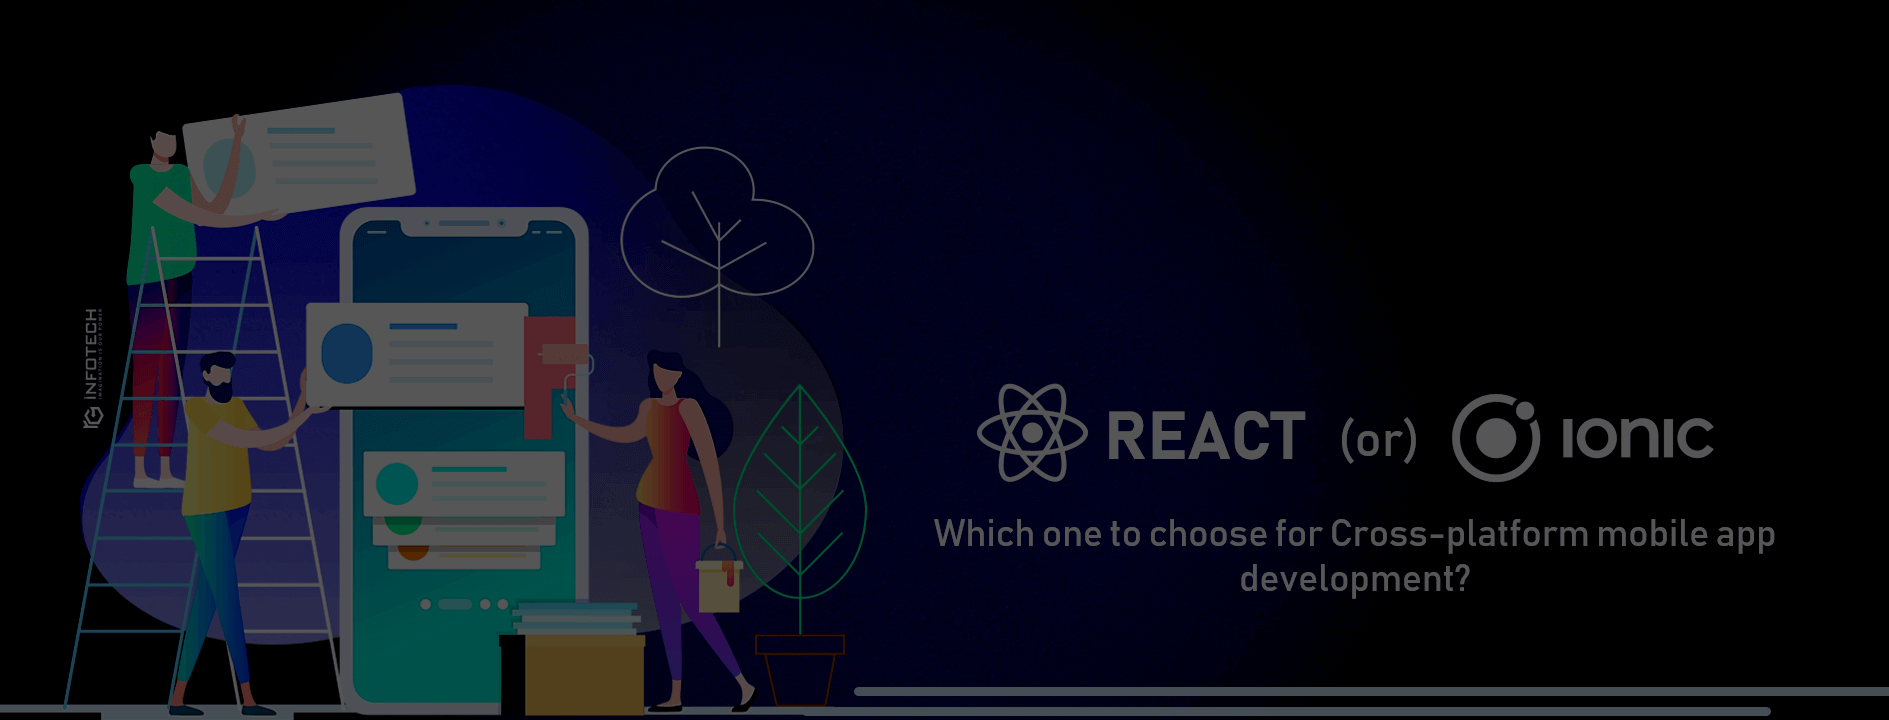 React-or-Ionic